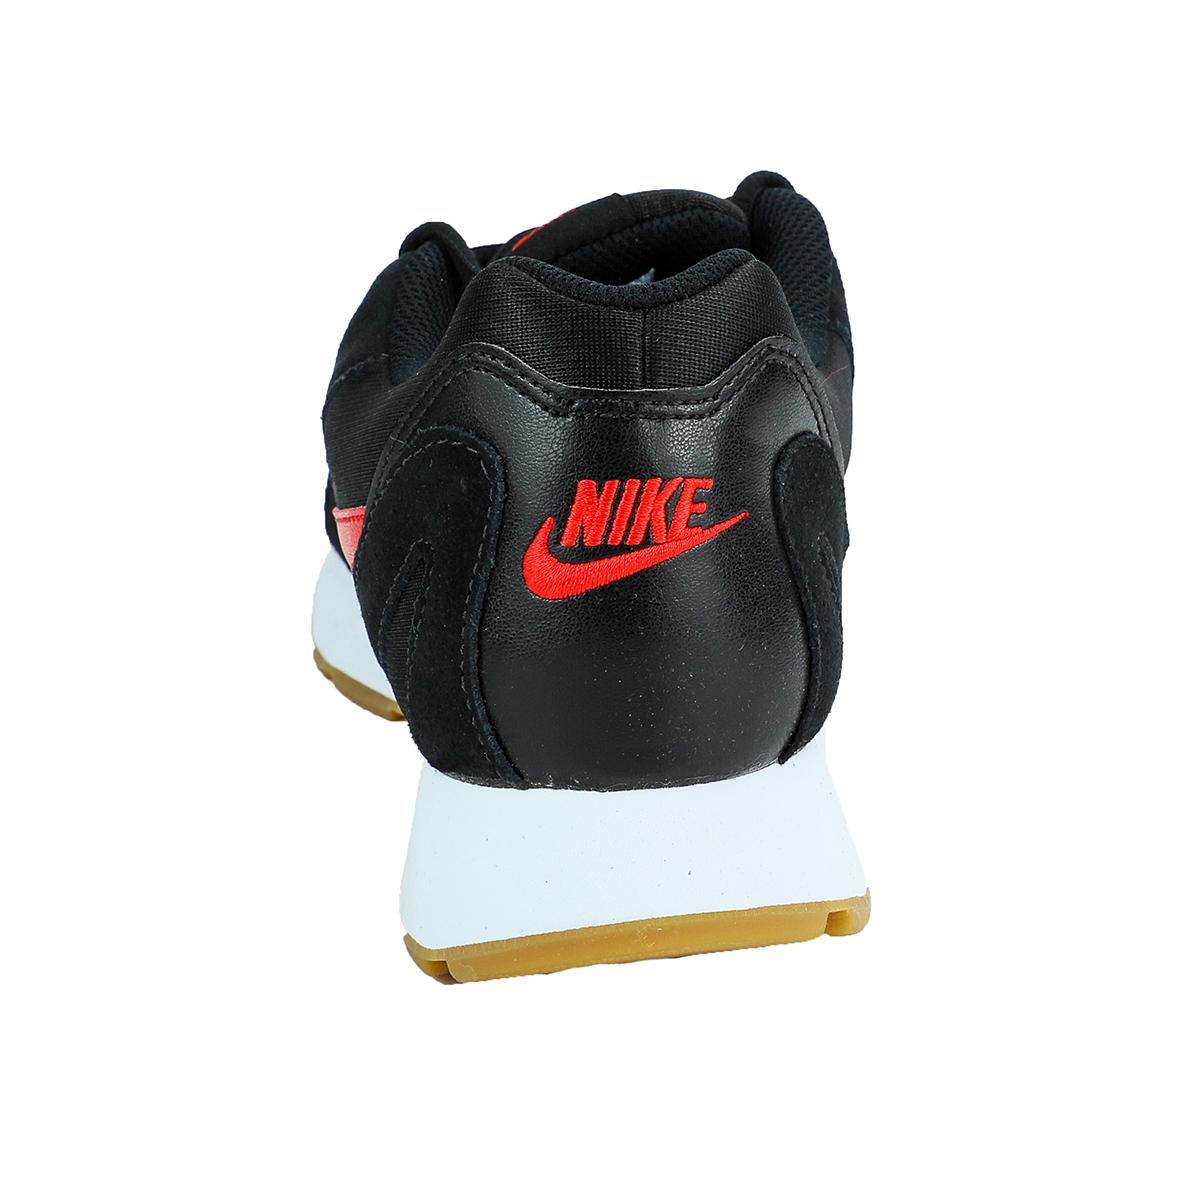 Nike-Men-039-s-Delfine-Running-Shoes thumbnail 8